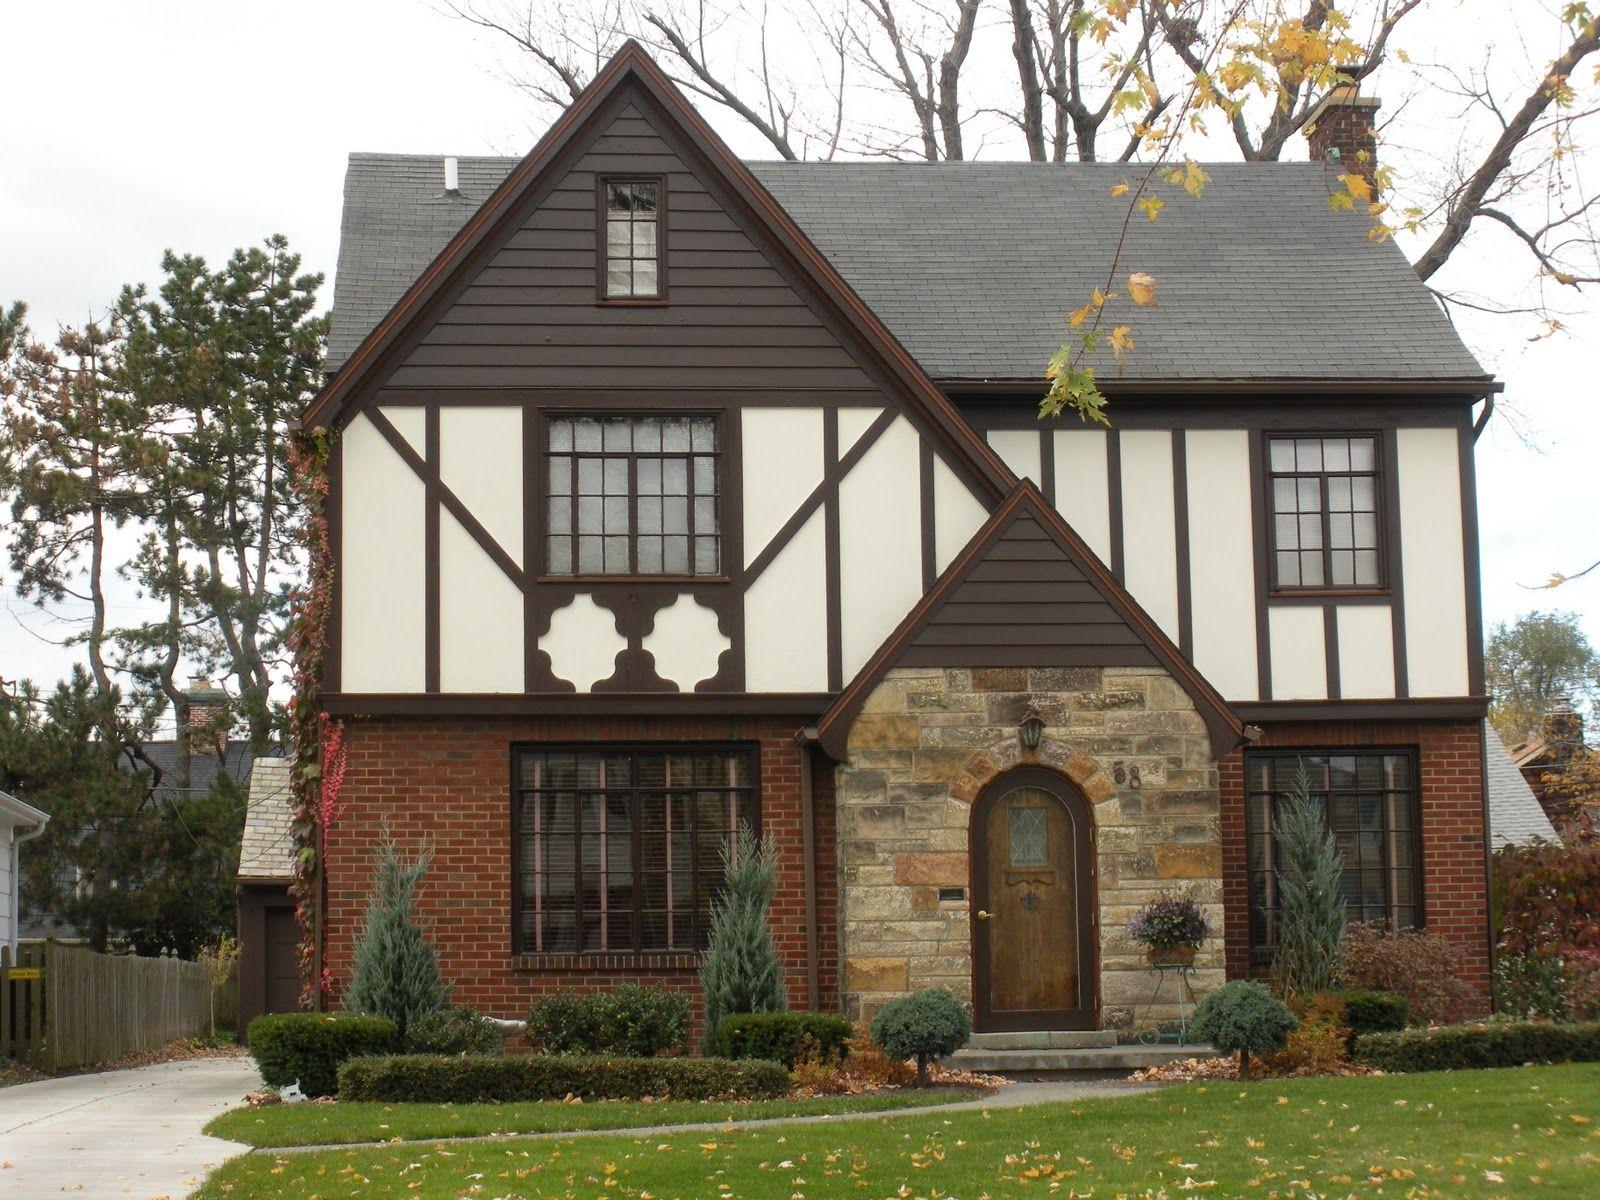 River City Sammon: Tudor Revival Style House Makeover, Part 1 ...